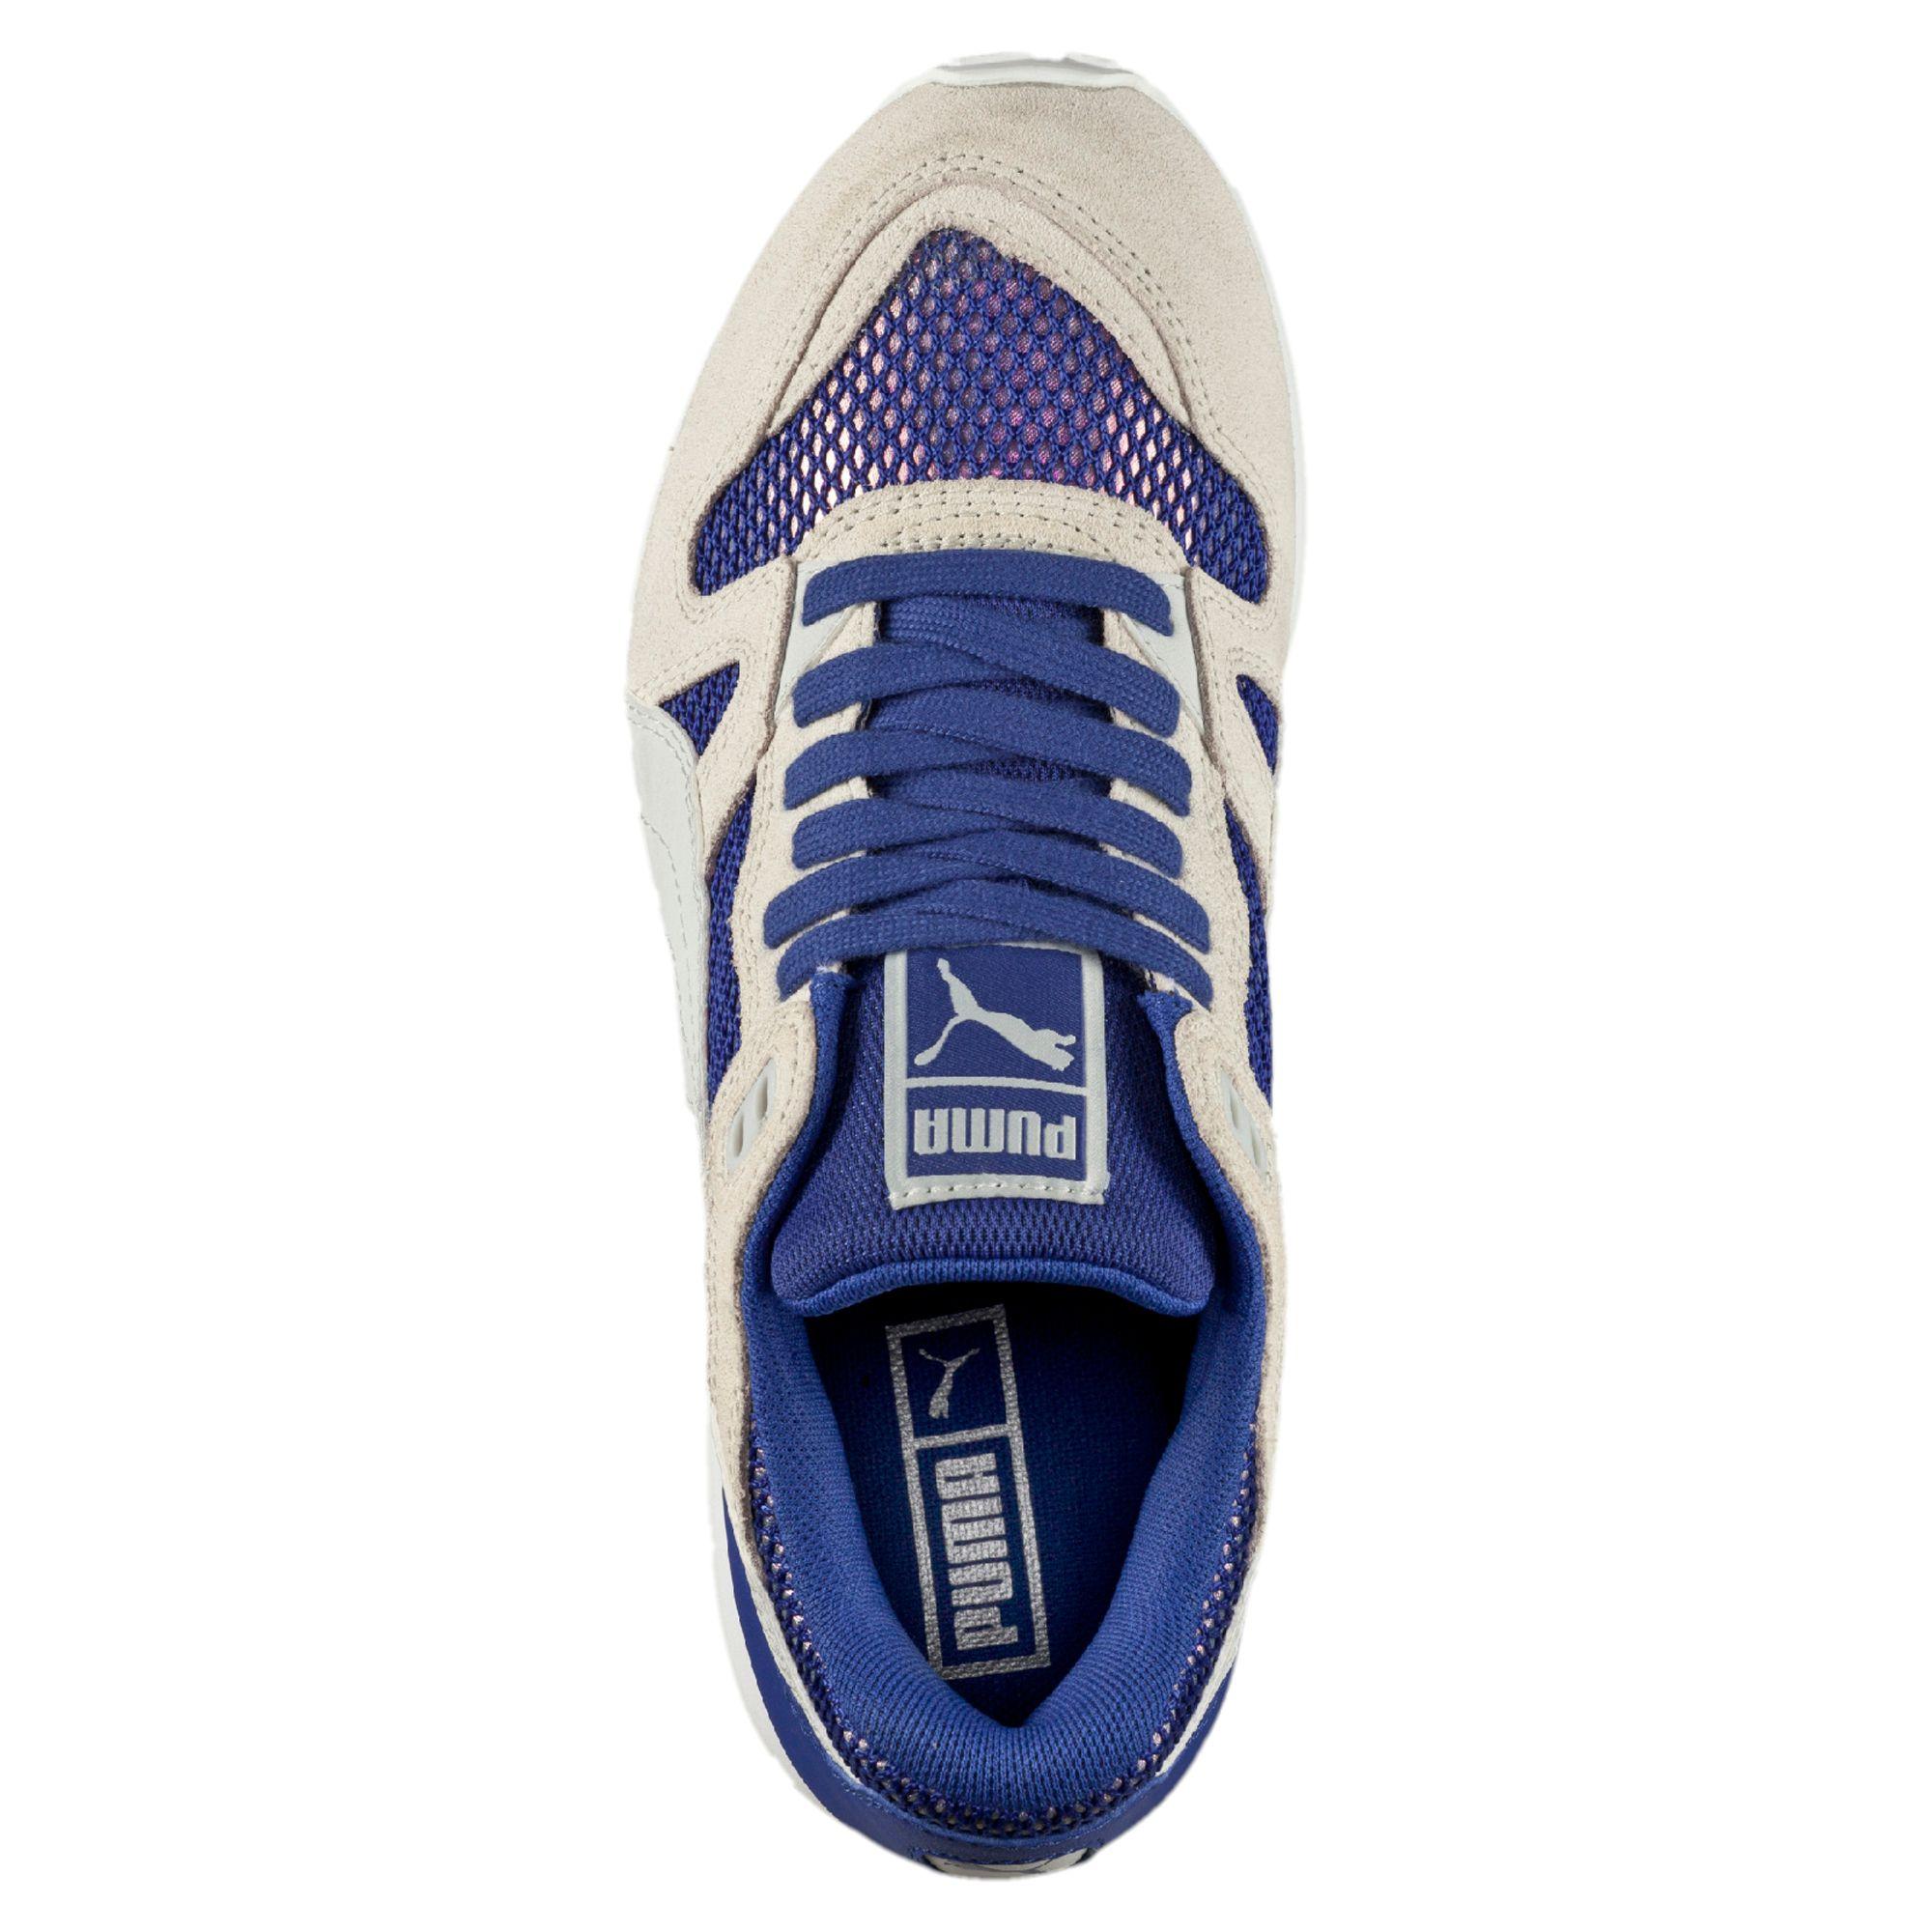 PUMA Duplex OG Remastered DC4 Damen Sneaker Frauen Schuhe Sport Classics Neu